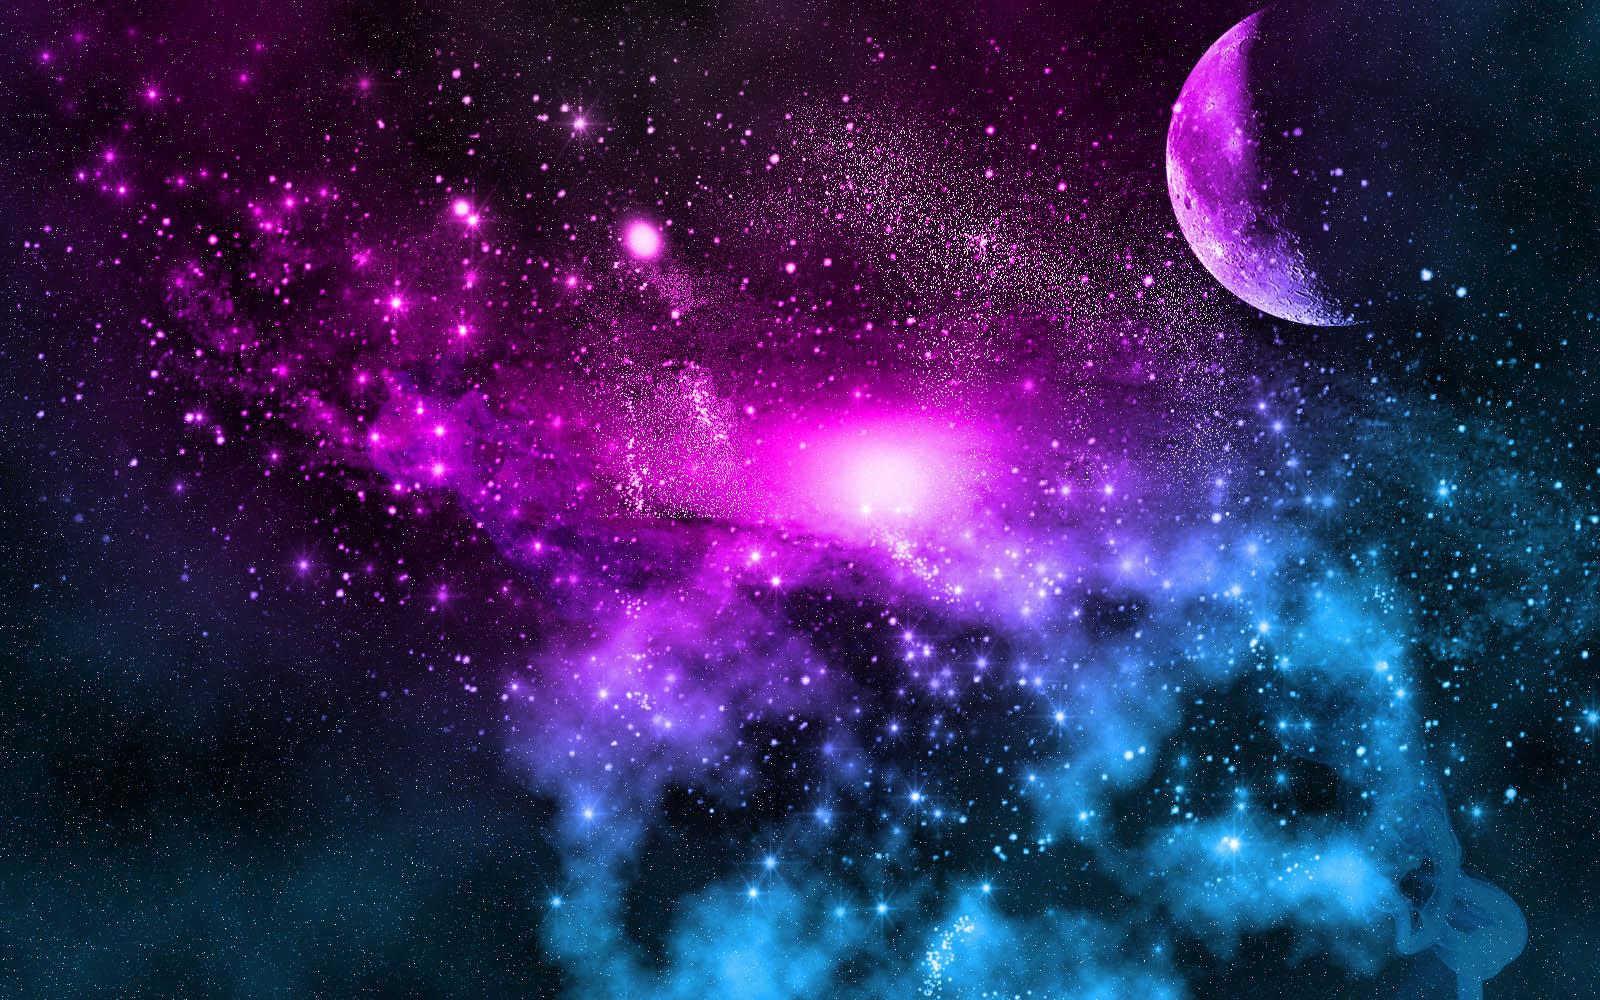 Beautiful moon galaxy images